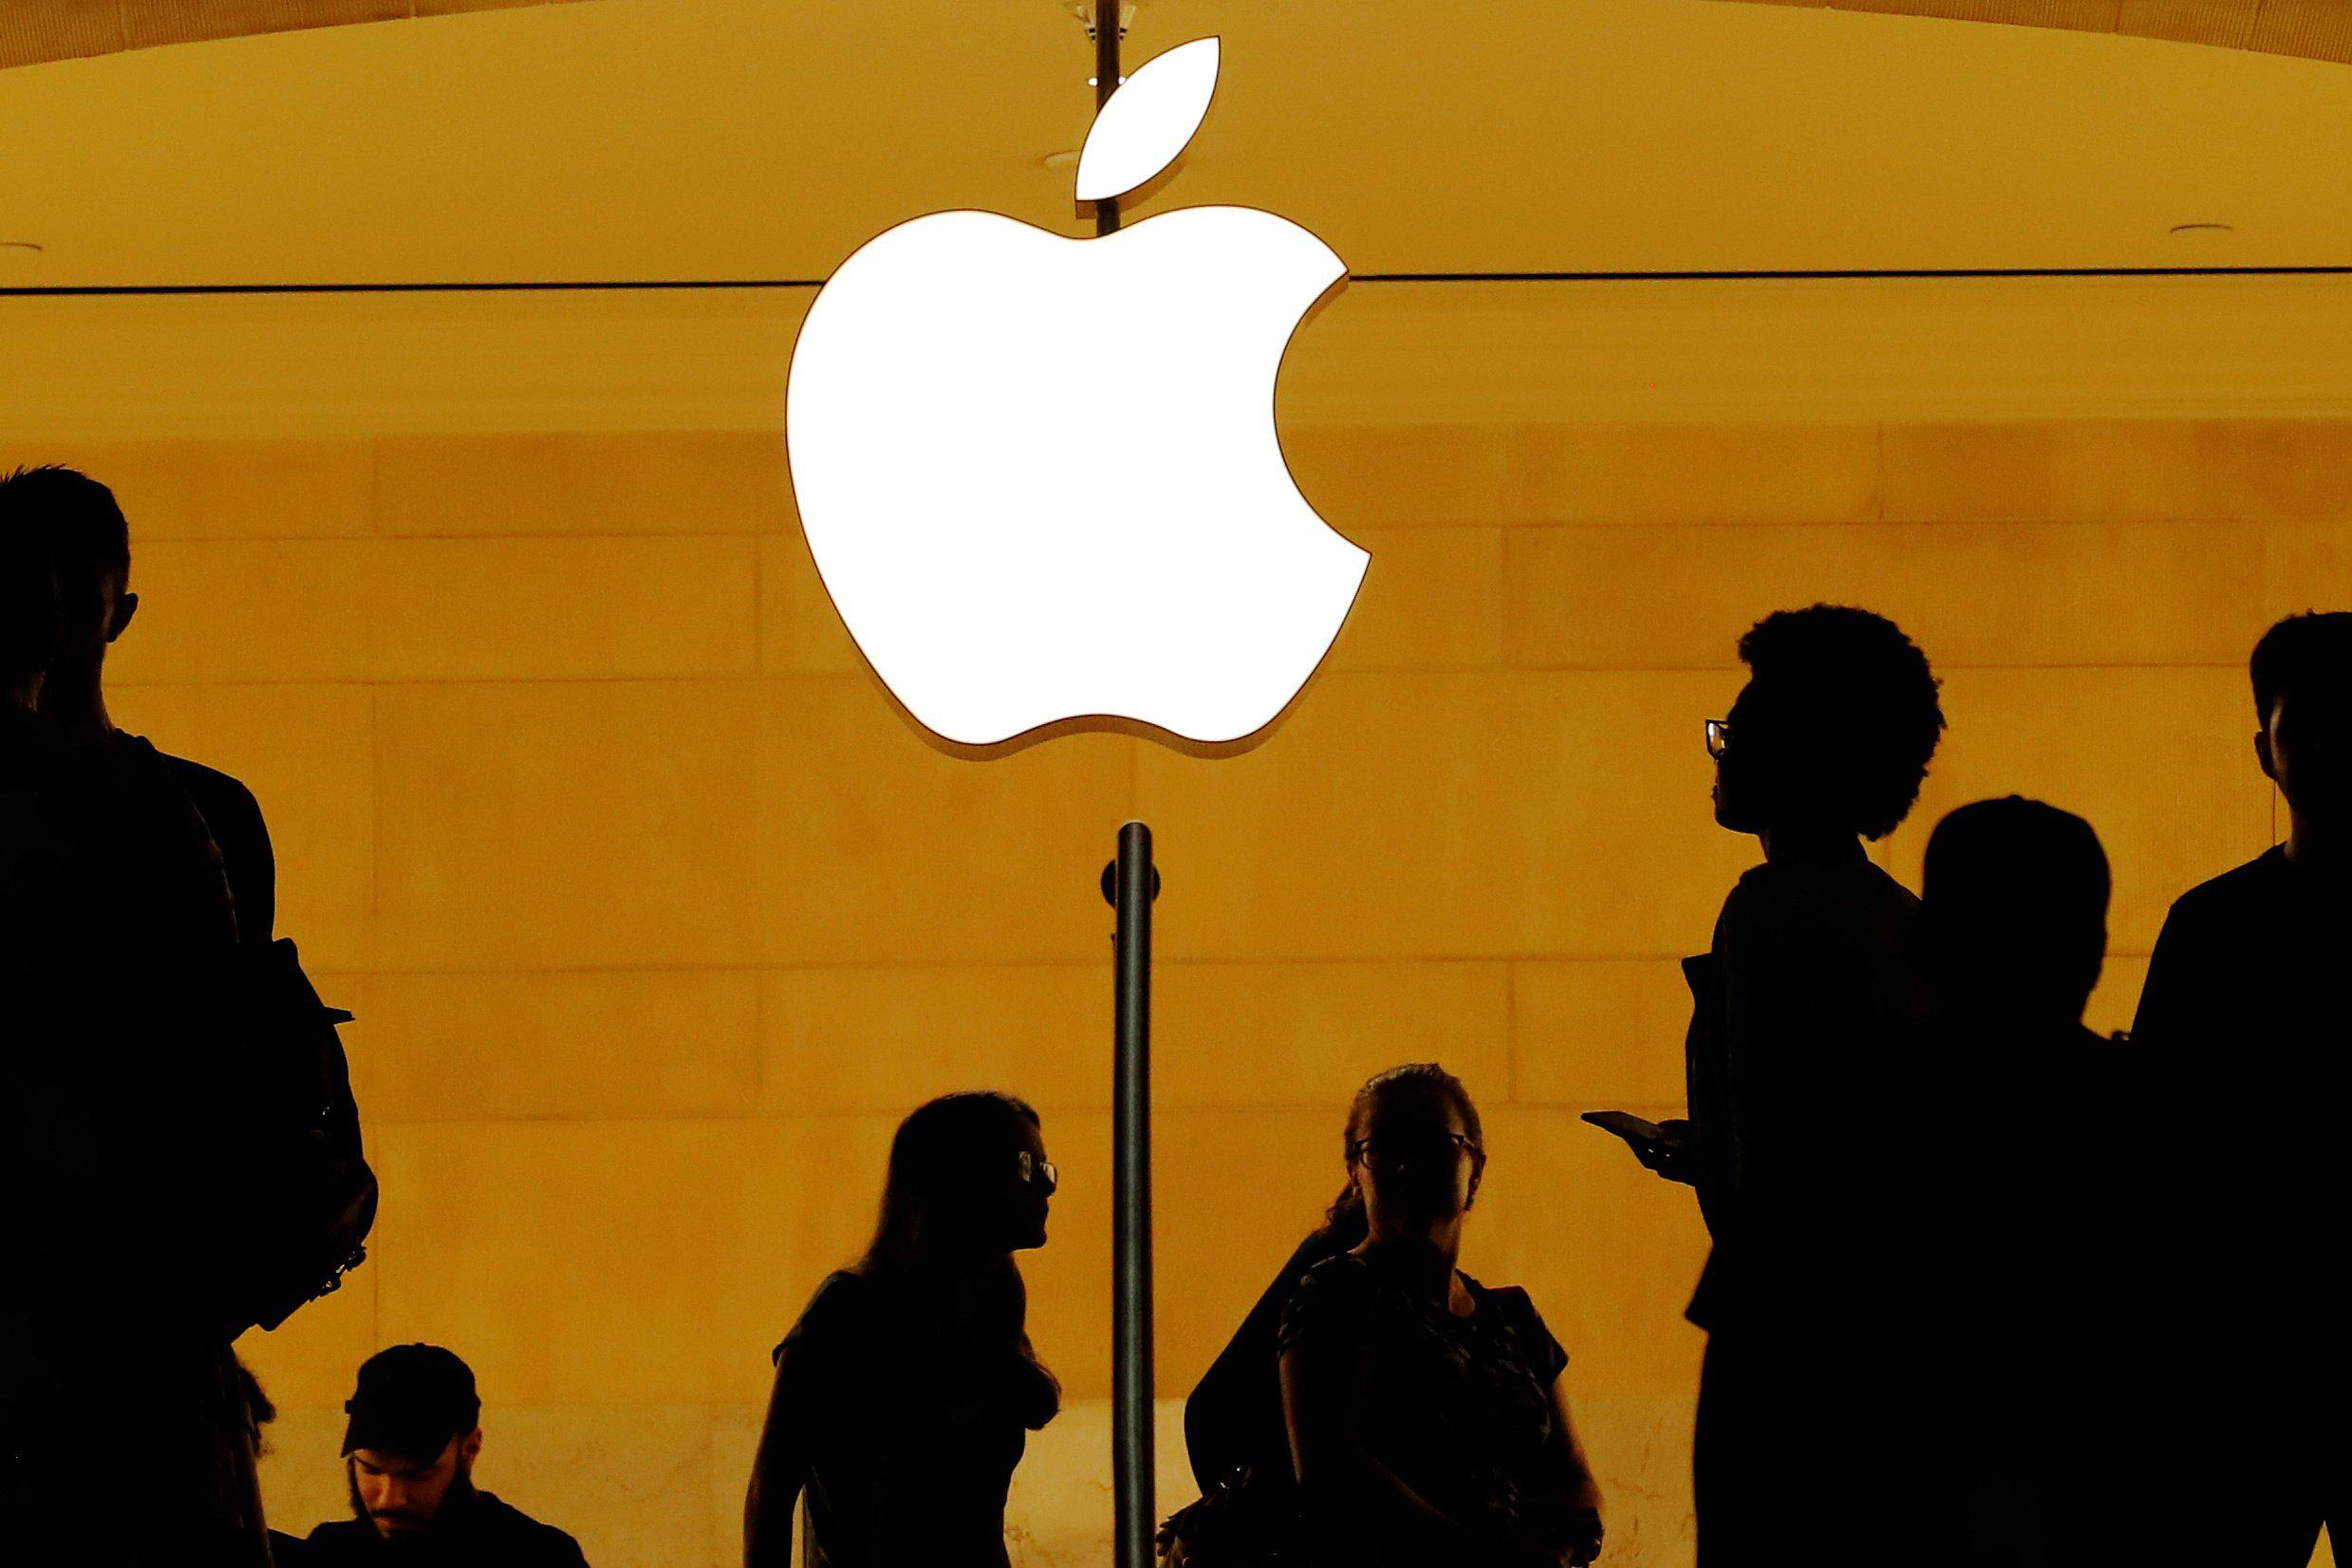 Ảnh tham khảo cổ phiếu apple